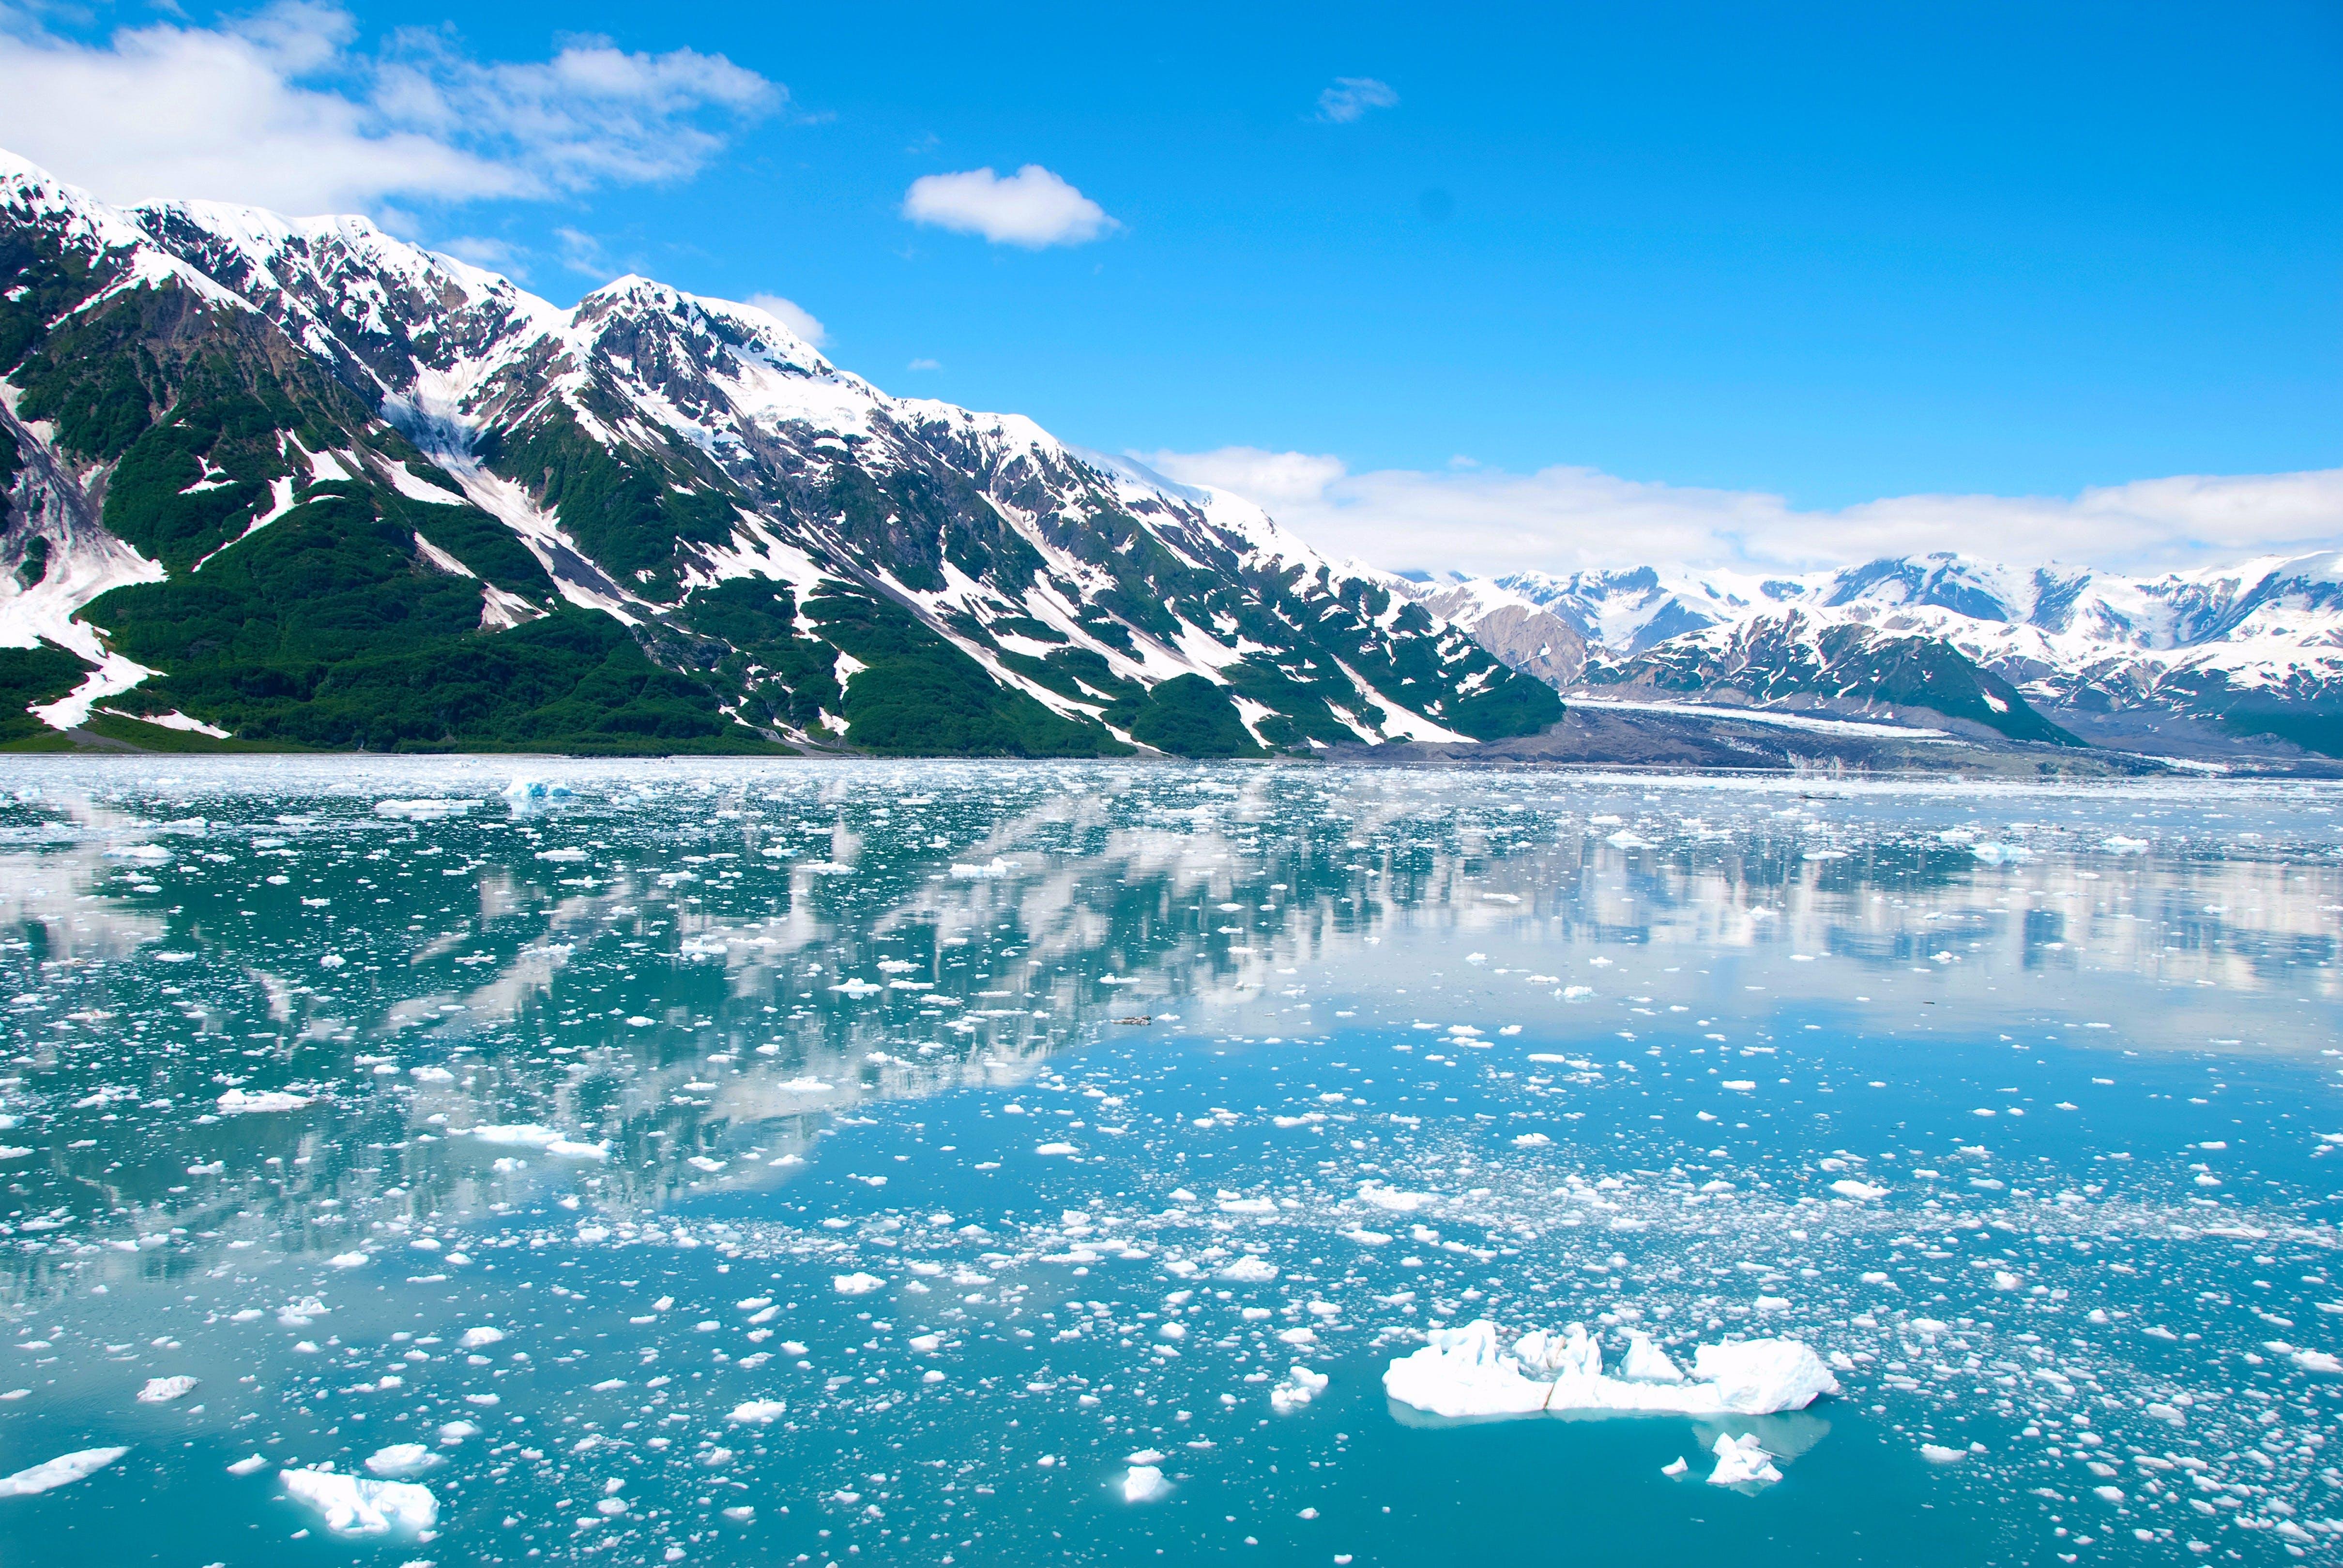 Kostenloses Stock Foto zu alaska, berge, blauer himmel, eis